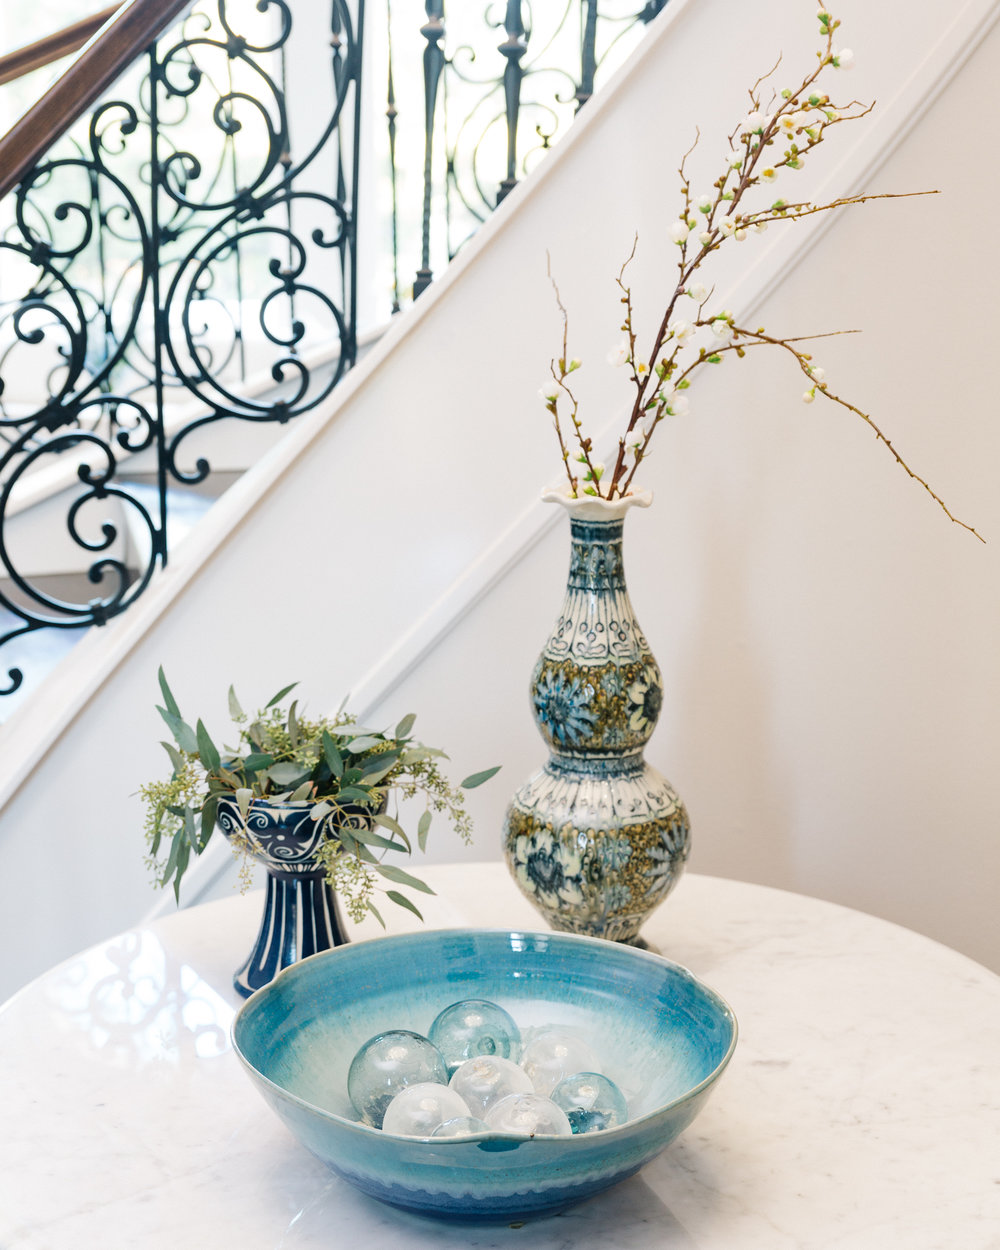 Entry Hall Foyer | Carla Aston - Designer, Colleen Scott - Photographer #console #foyer #entryhall #foyerideas